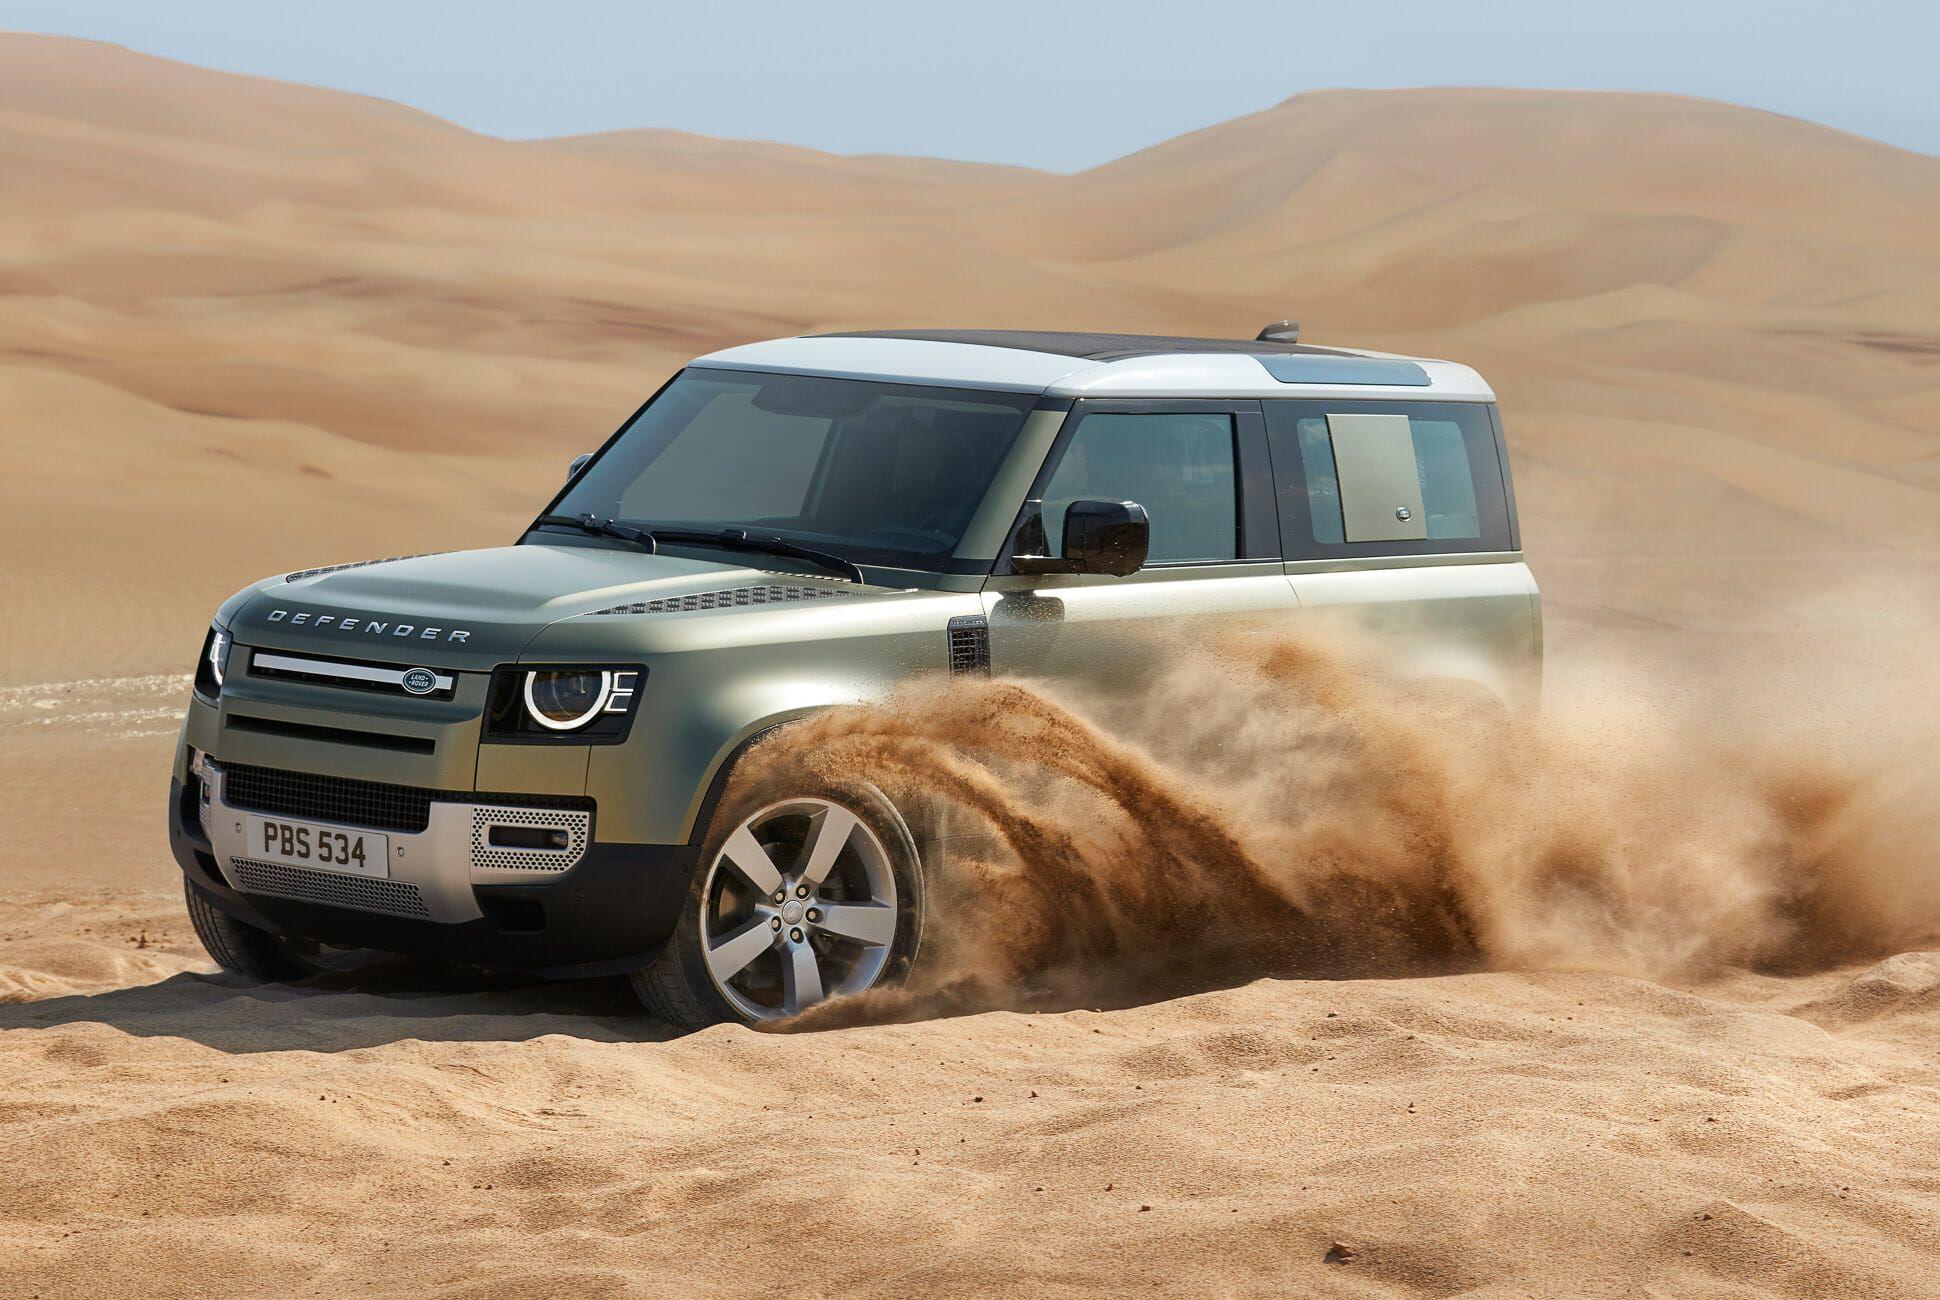 Land Rover Defender Gear Patrol-Exterior Action-Slide-02